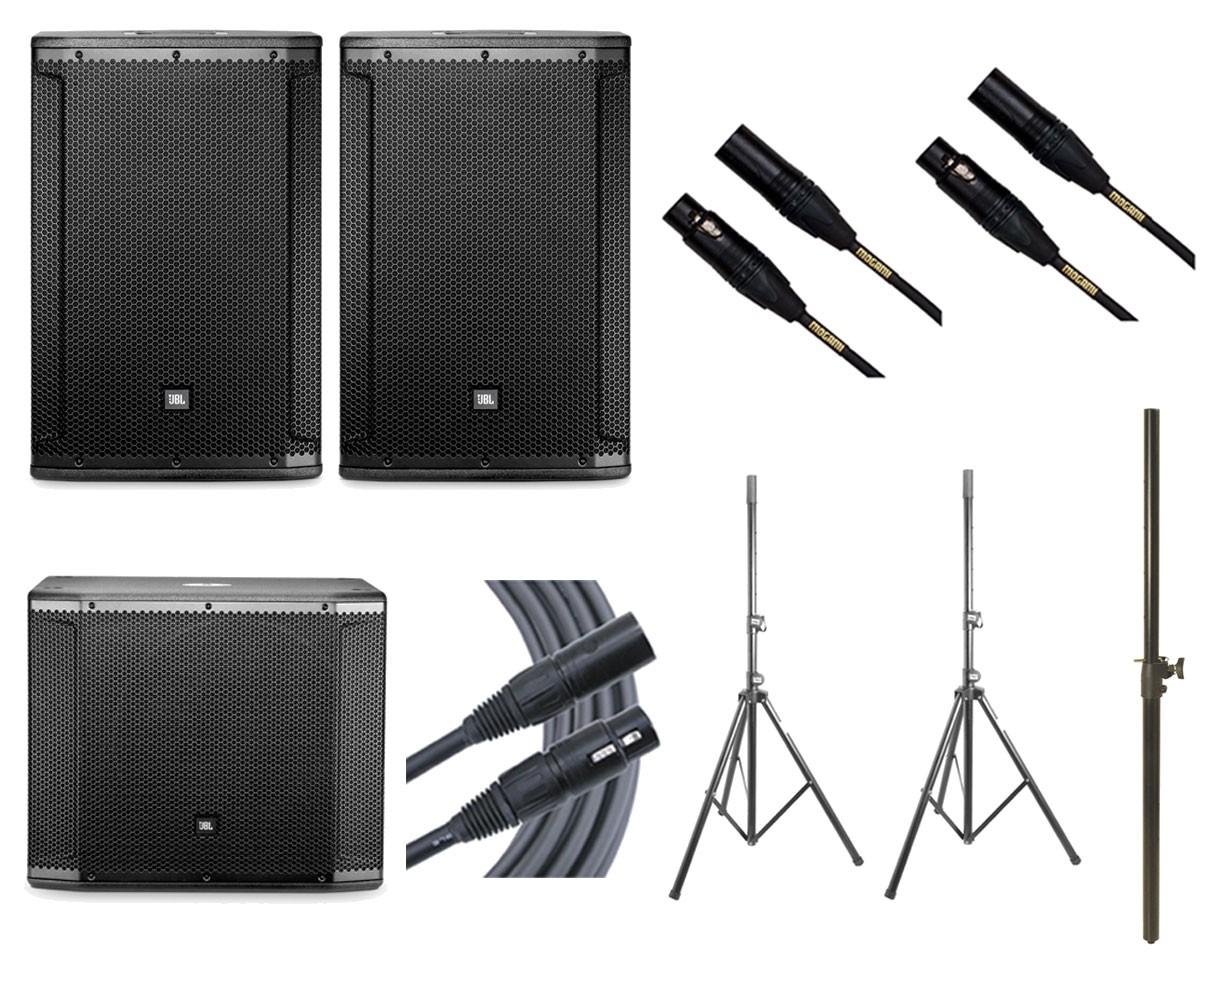 2x JBL SRX815P + JBL SRX818SP + 2x Ultimate TS-100B + Mogami Cables + Pole